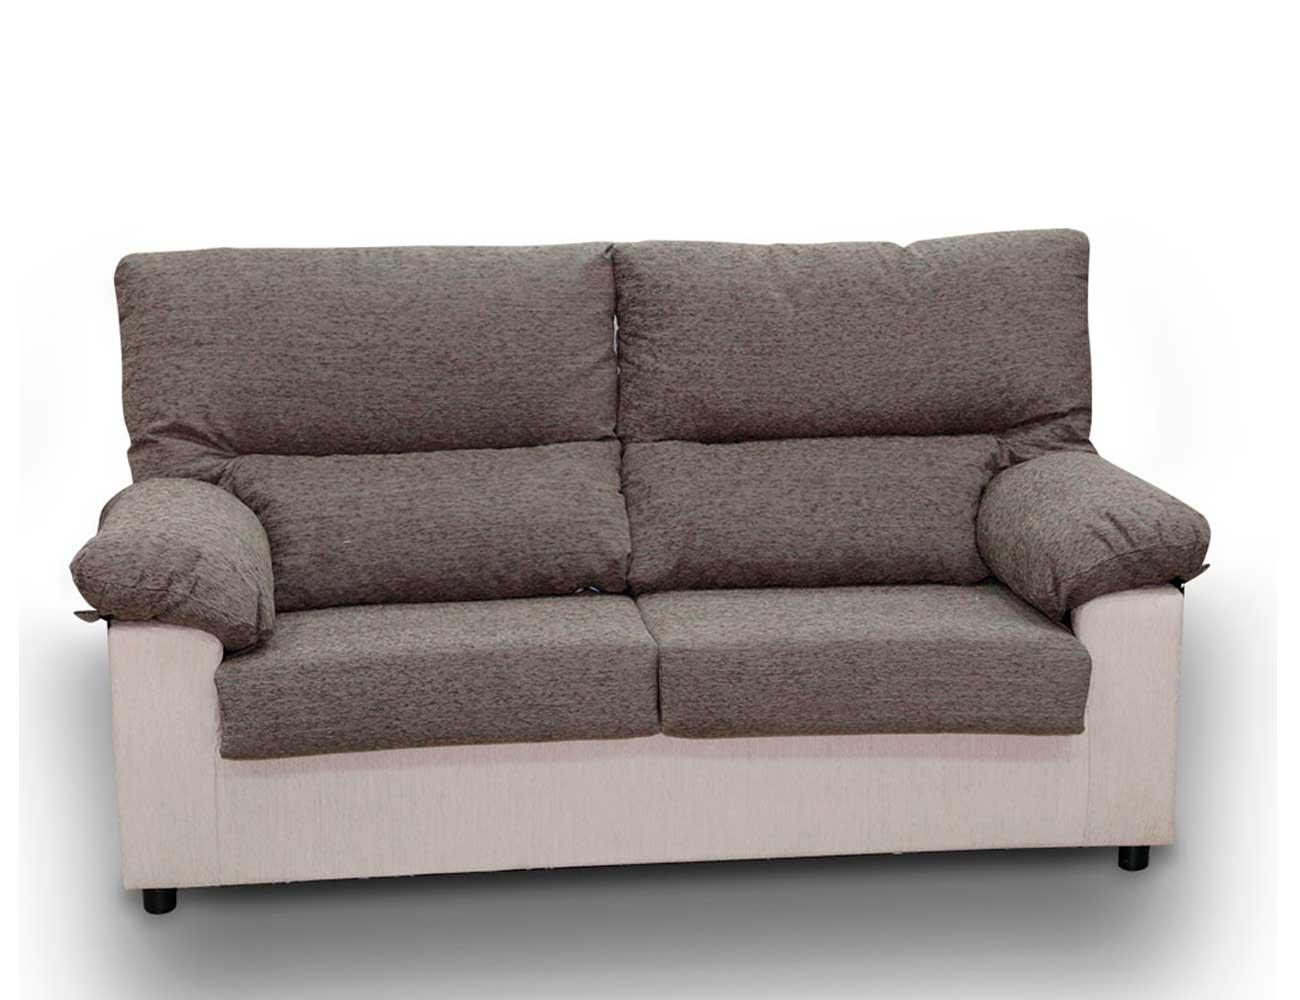 Sofa 3 plazas barato16